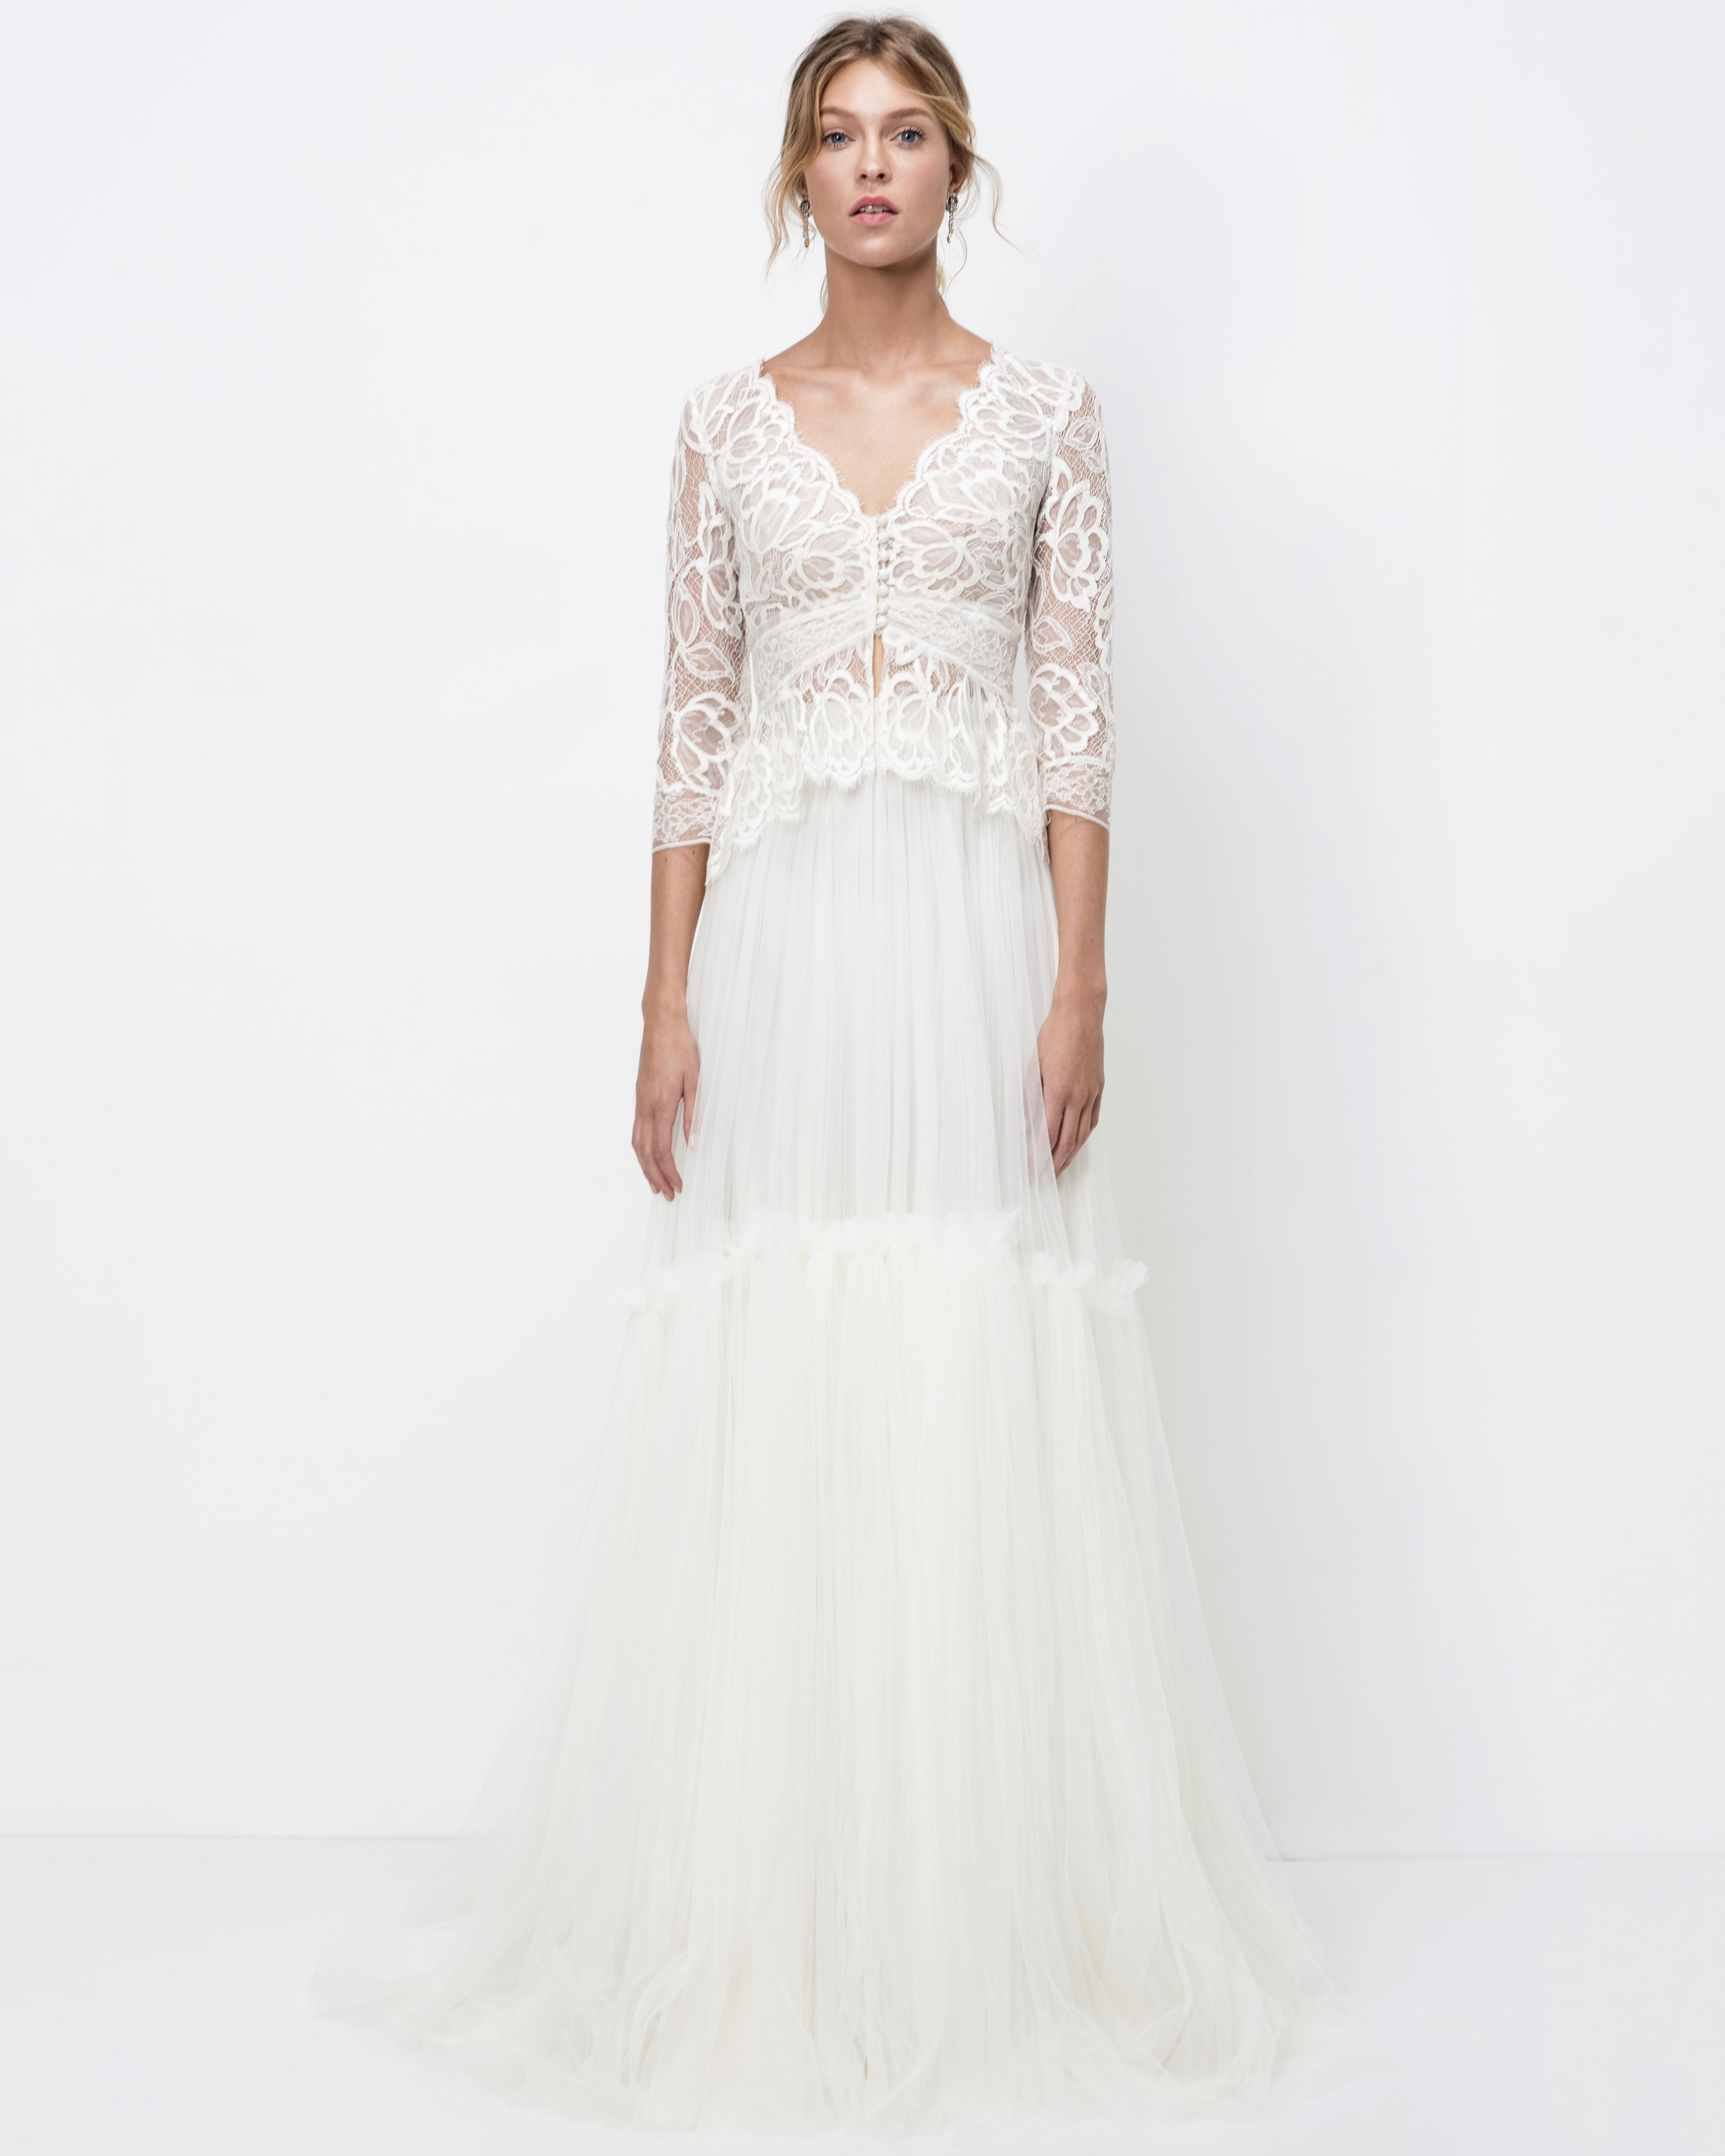 lihi hod a-line wedding dress with three-quarter length sleeves fall 2018